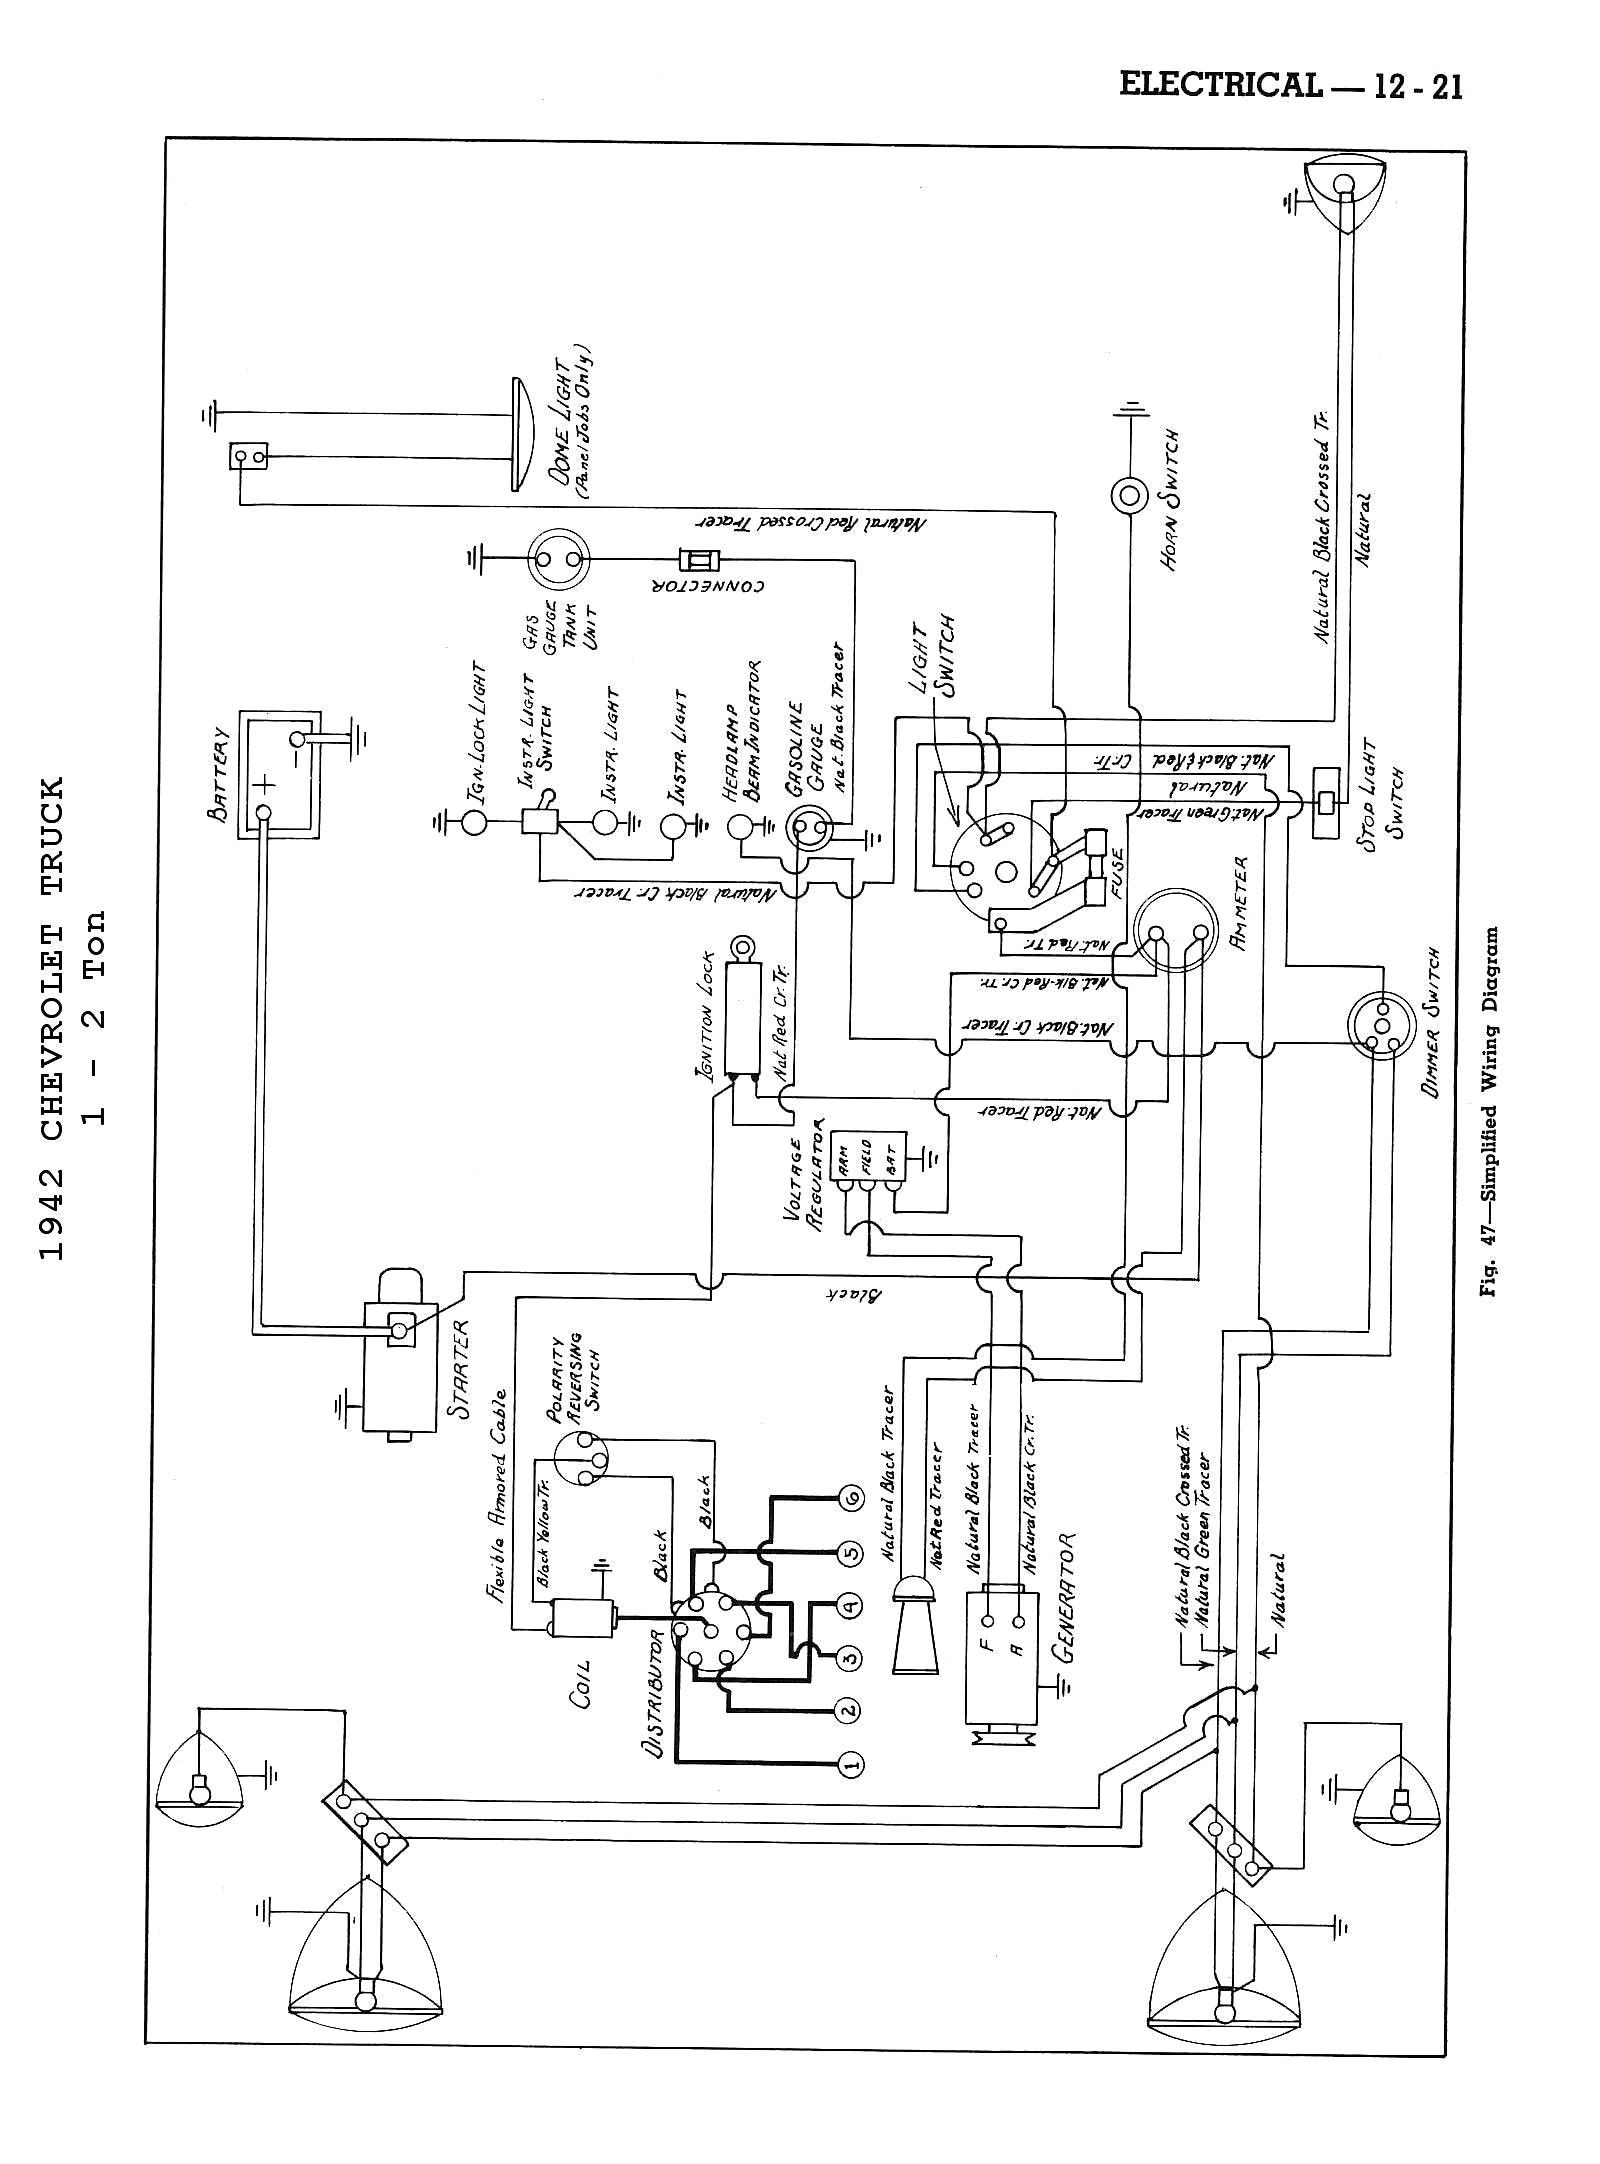 medium resolution of suburban water heater wiring diagram electrical in 2019 kenmore suburban hot water heater wiring diagram suburban